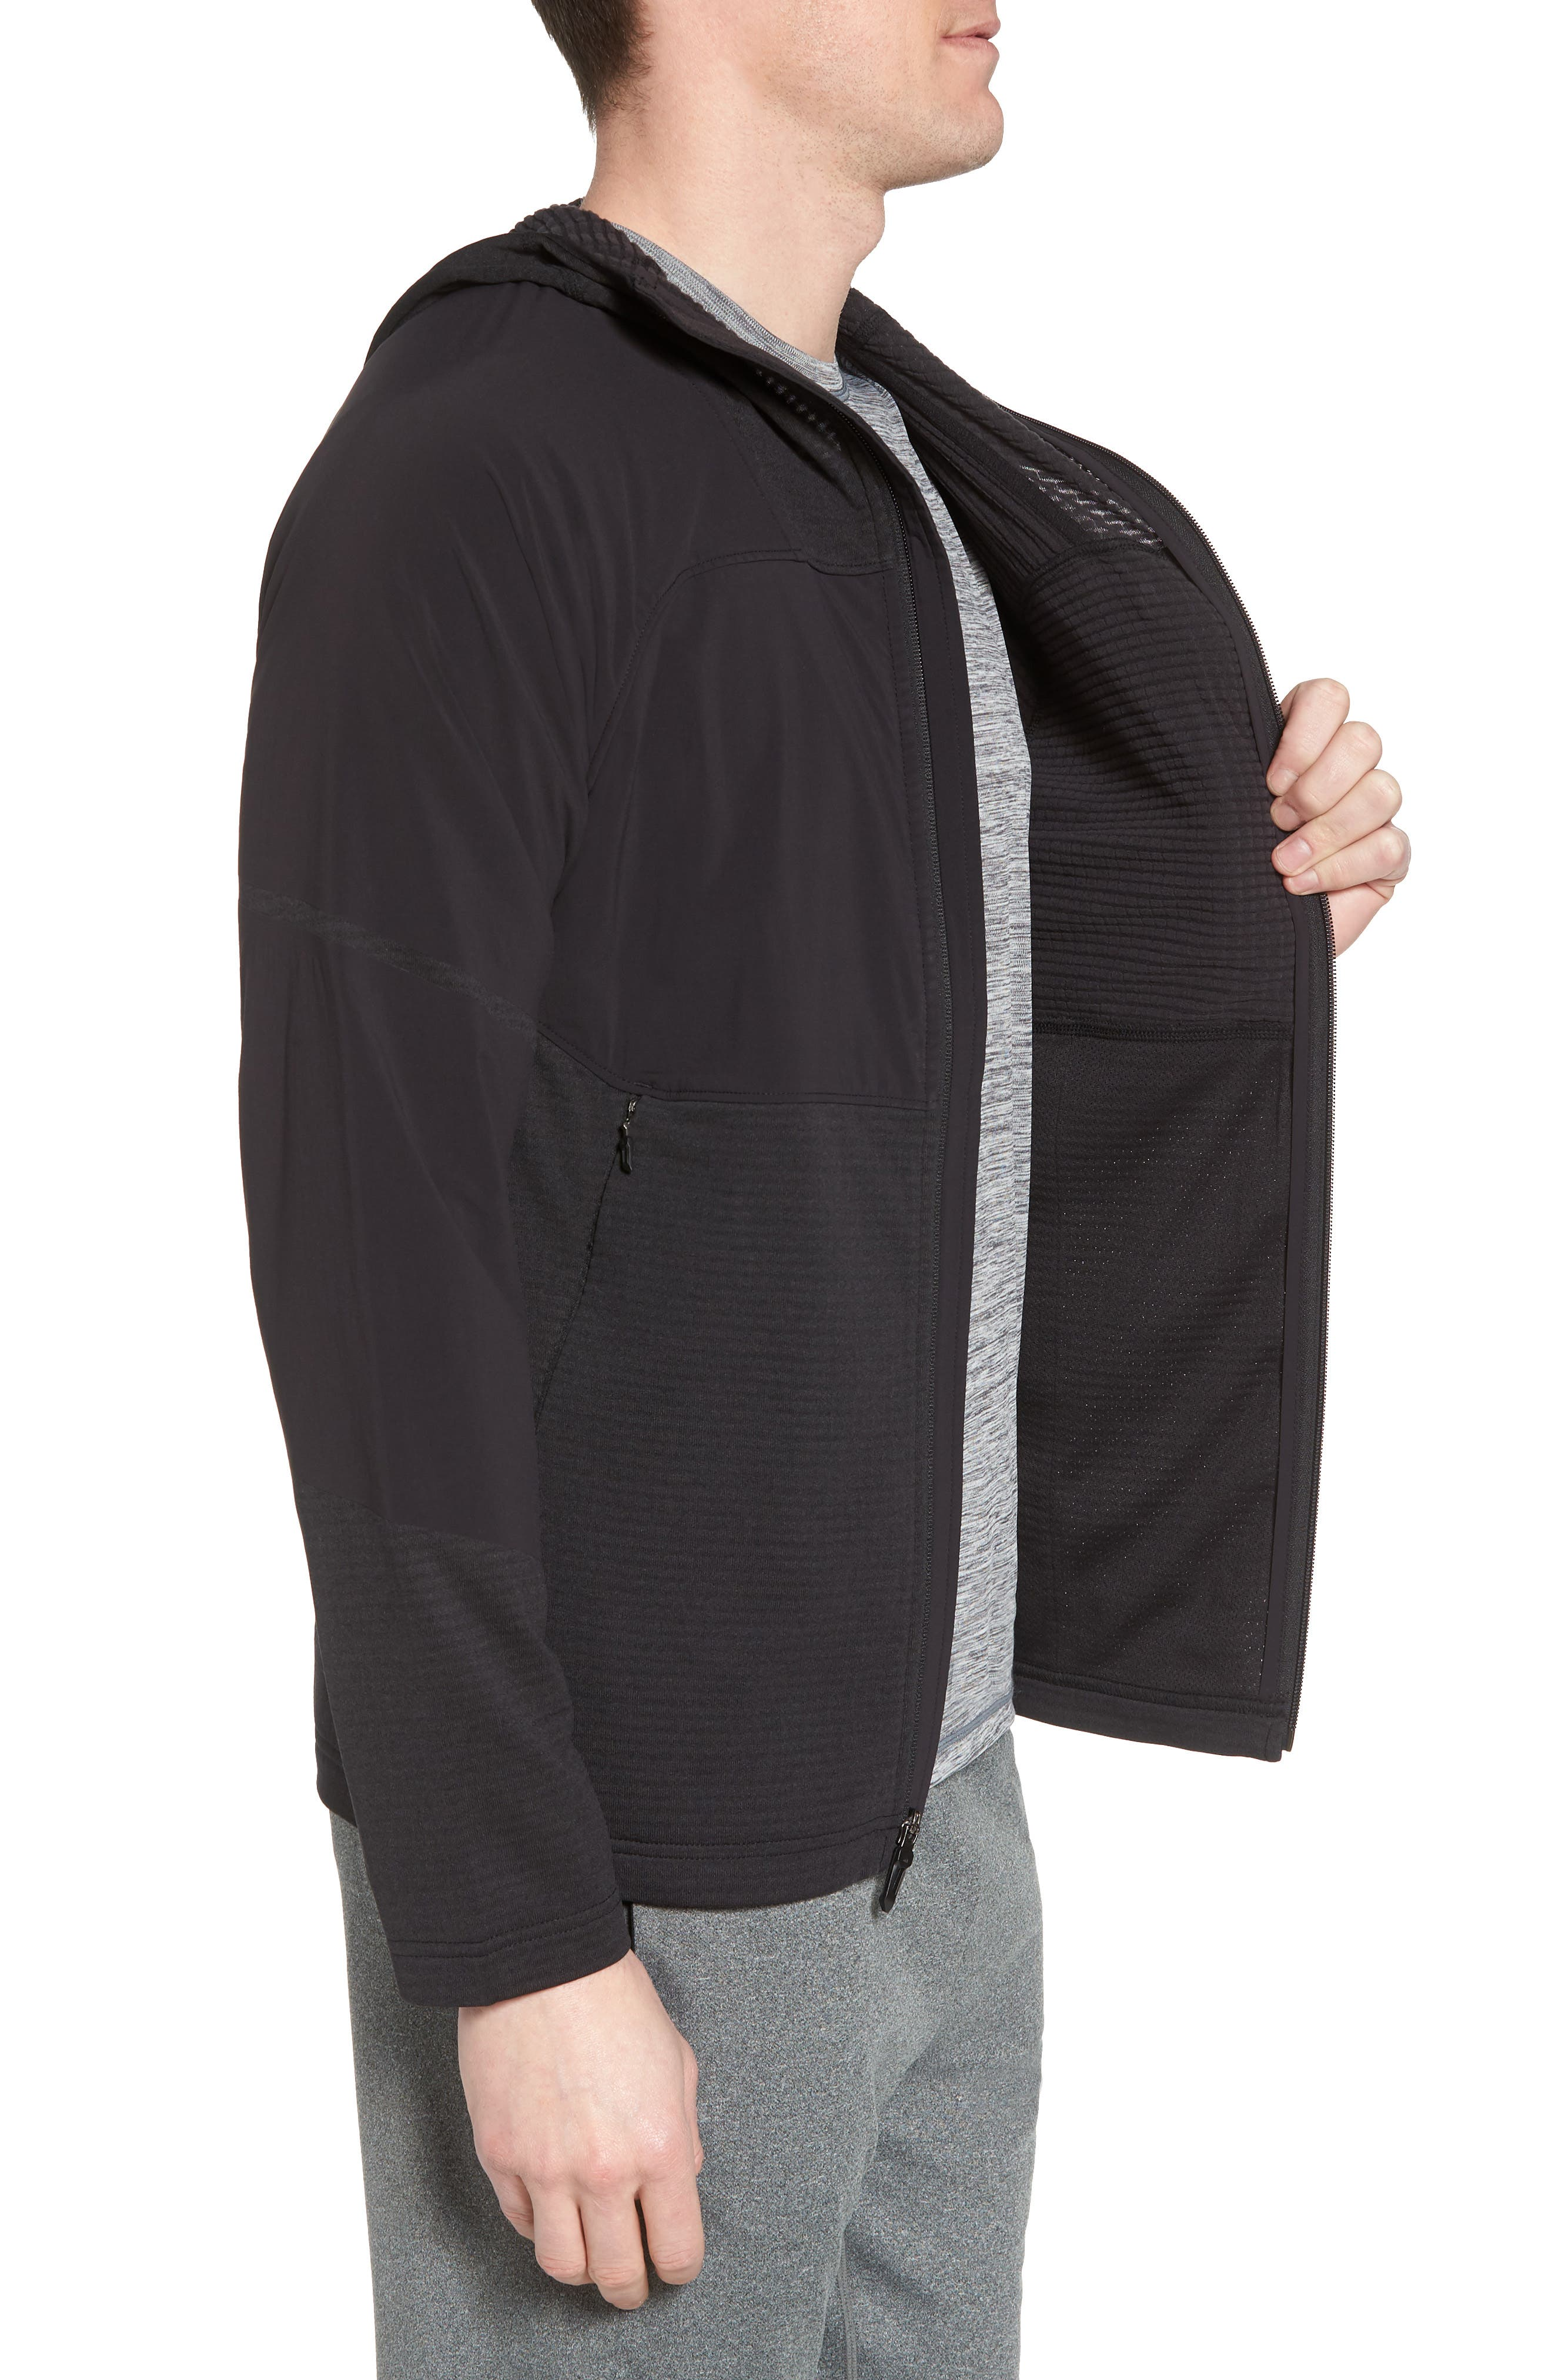 Progressor Power Grid<sup>™</sup> Hooded Fleece Jacket,                             Alternate thumbnail 3, color,                             Black/ Black